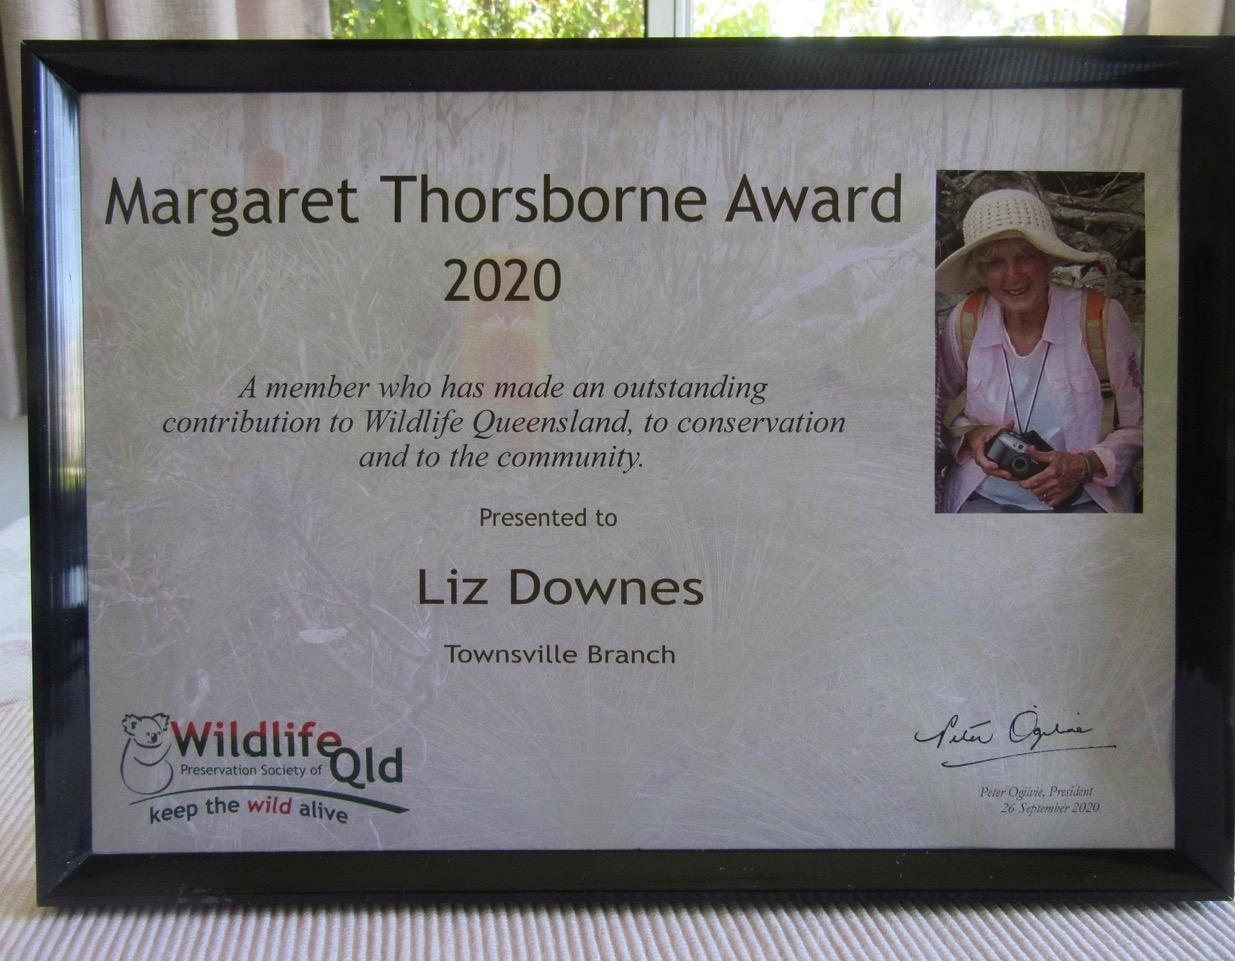 Margaret Thorsborne Award